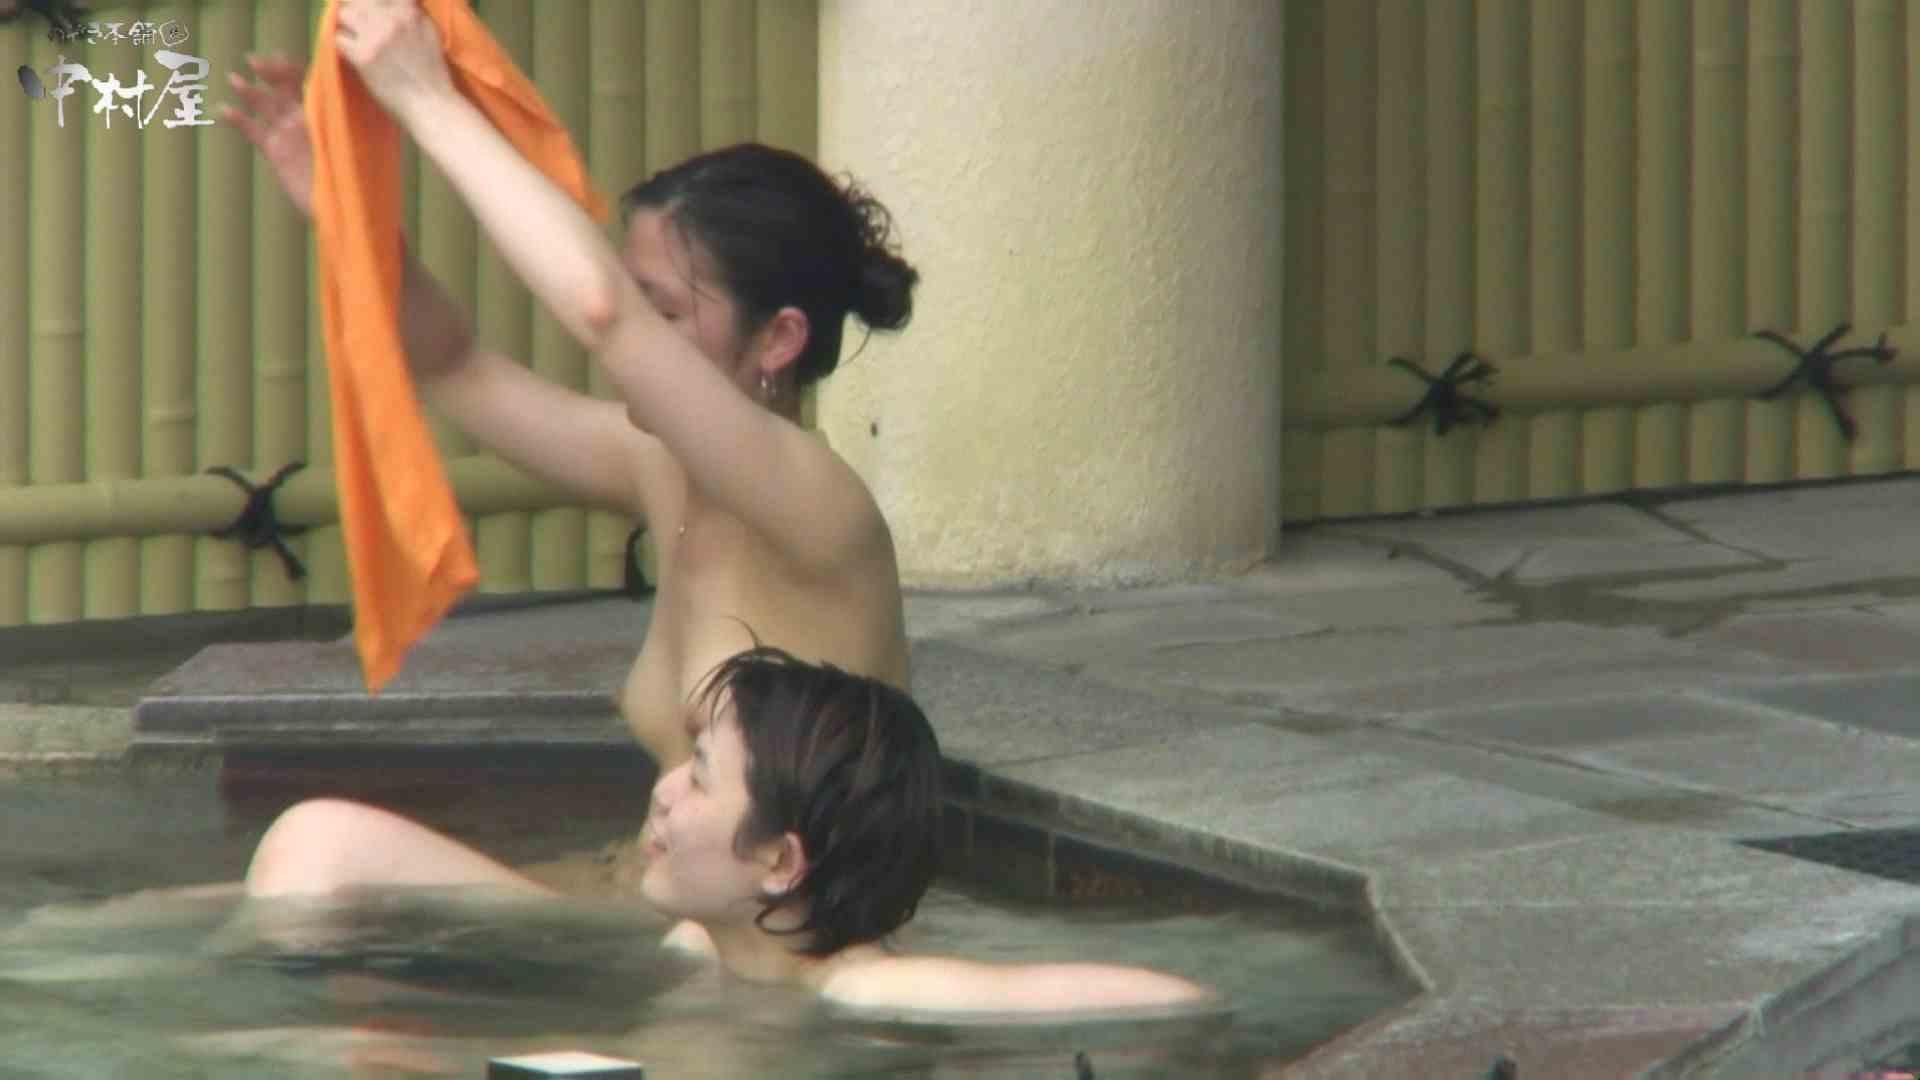 Aquaな露天風呂Vol.945 露天 オマンコ無修正動画無料 60PICs 14